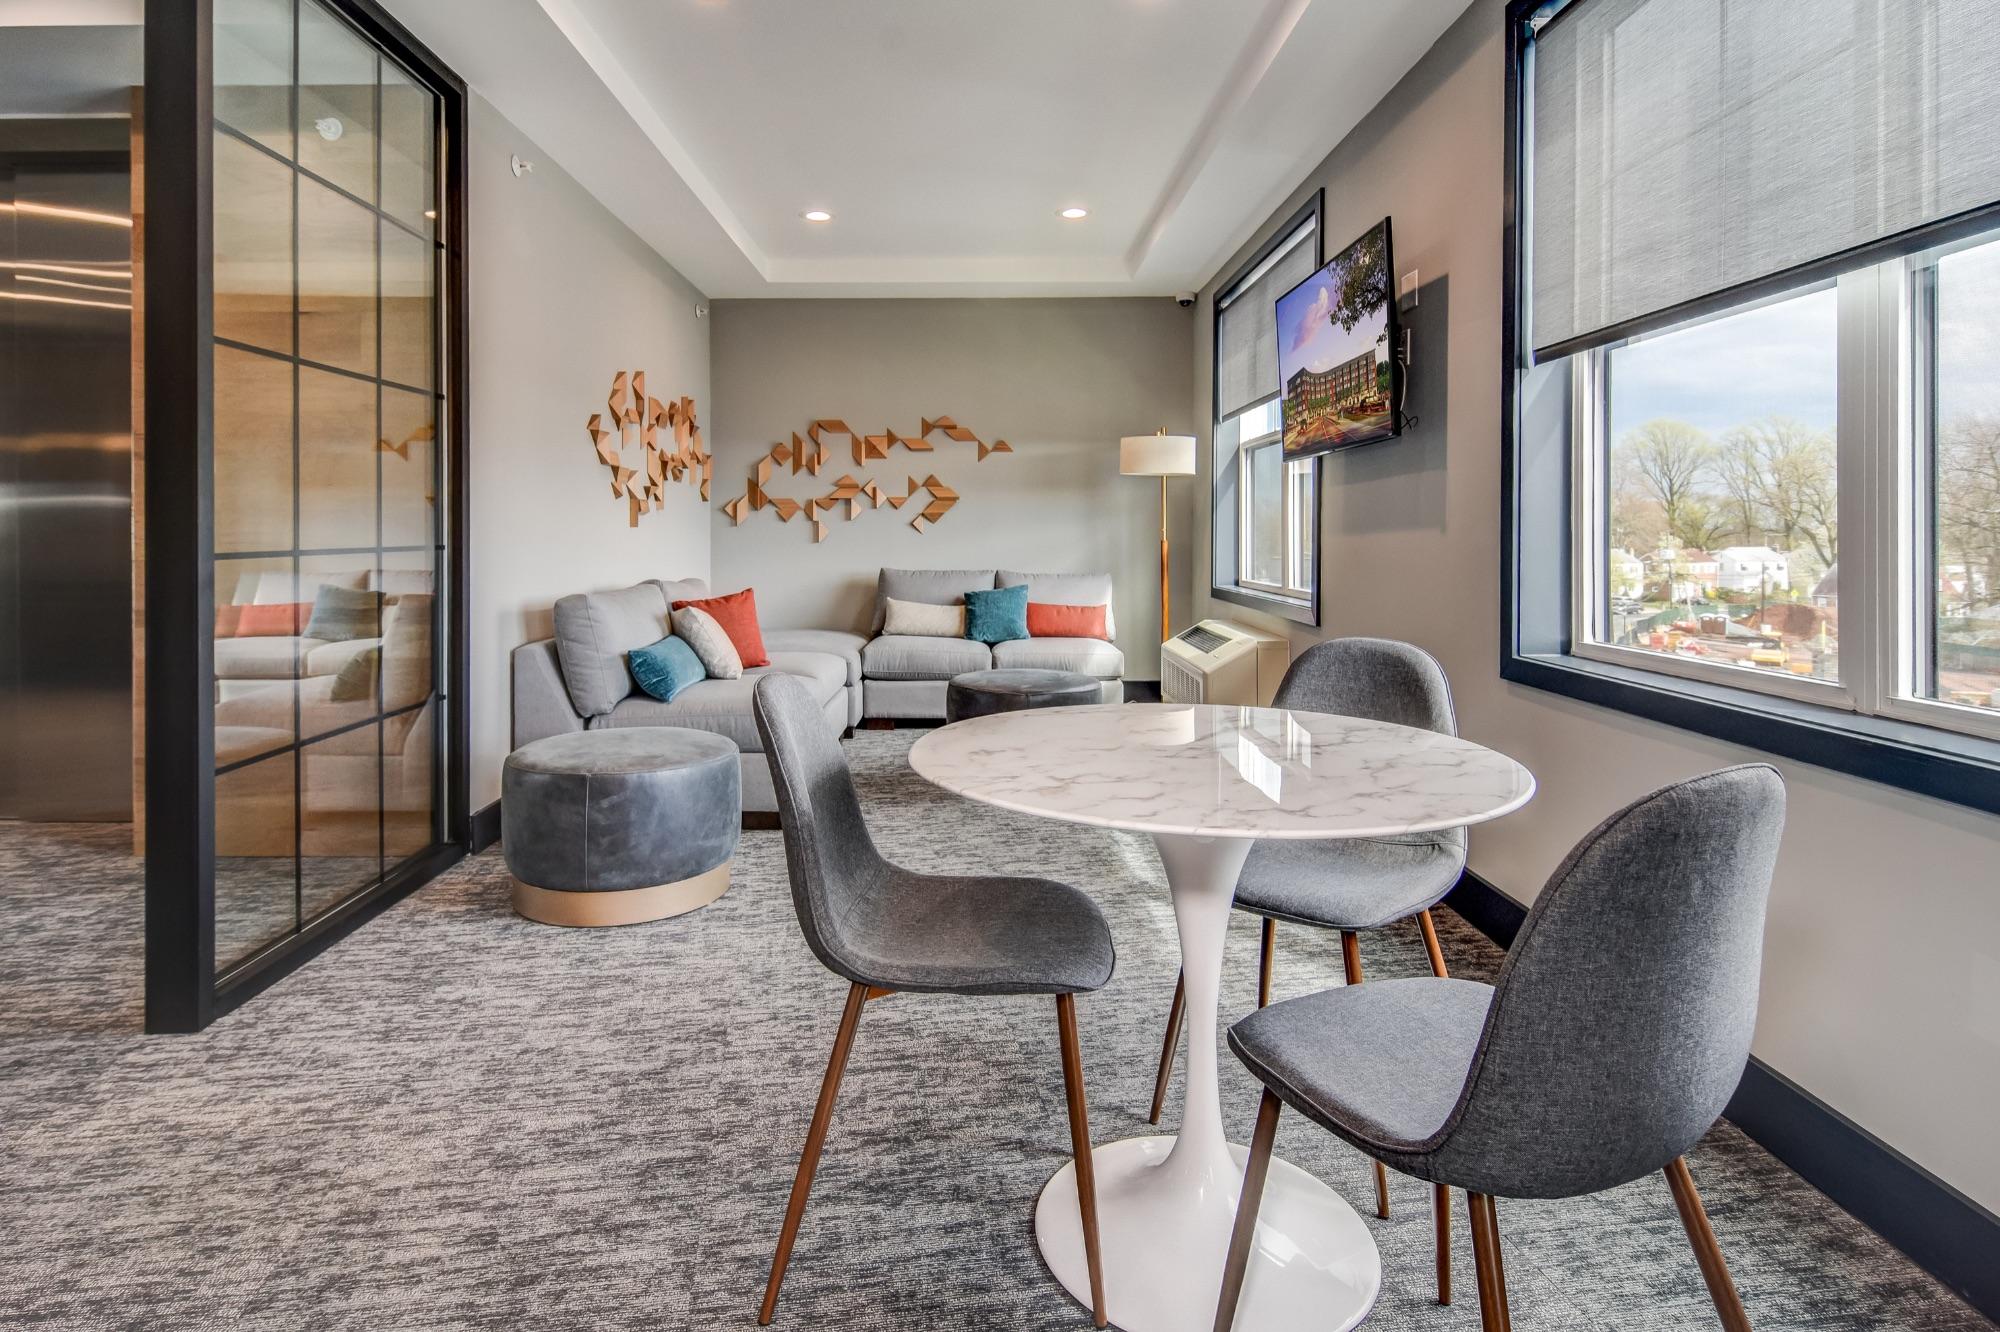 Amenity_Lounge area_Union, NJ